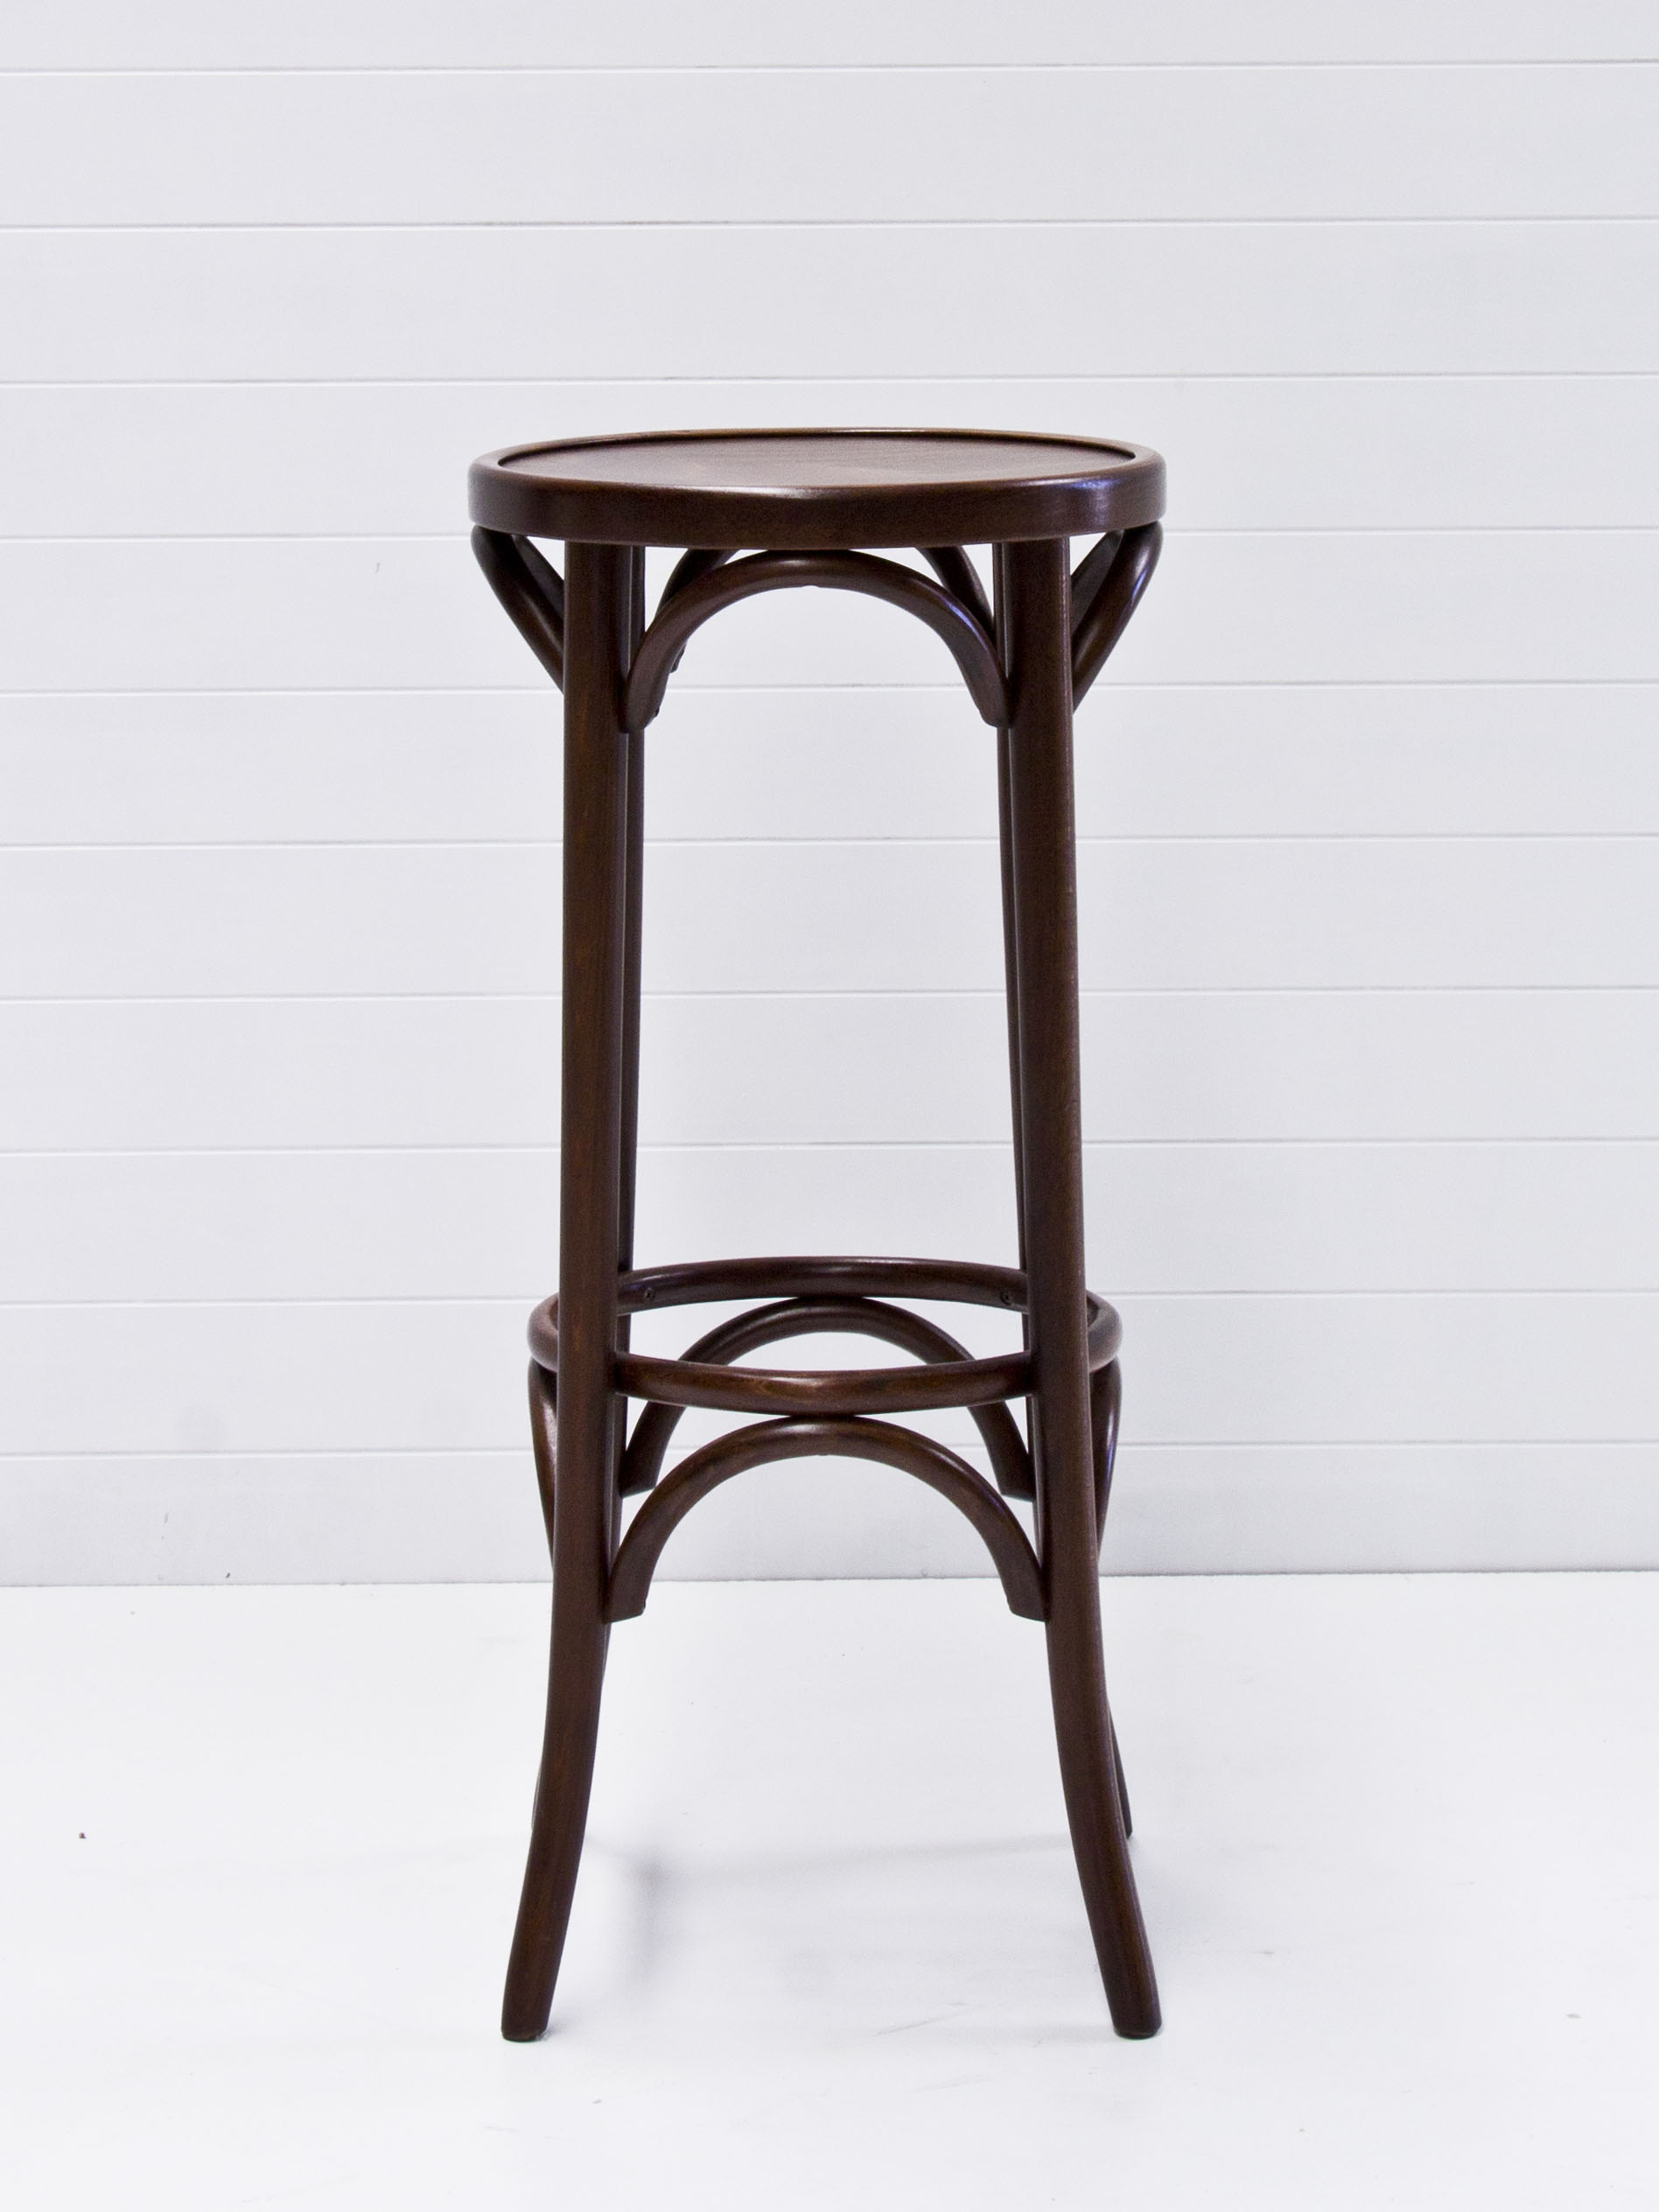 Walnut bentwood stool